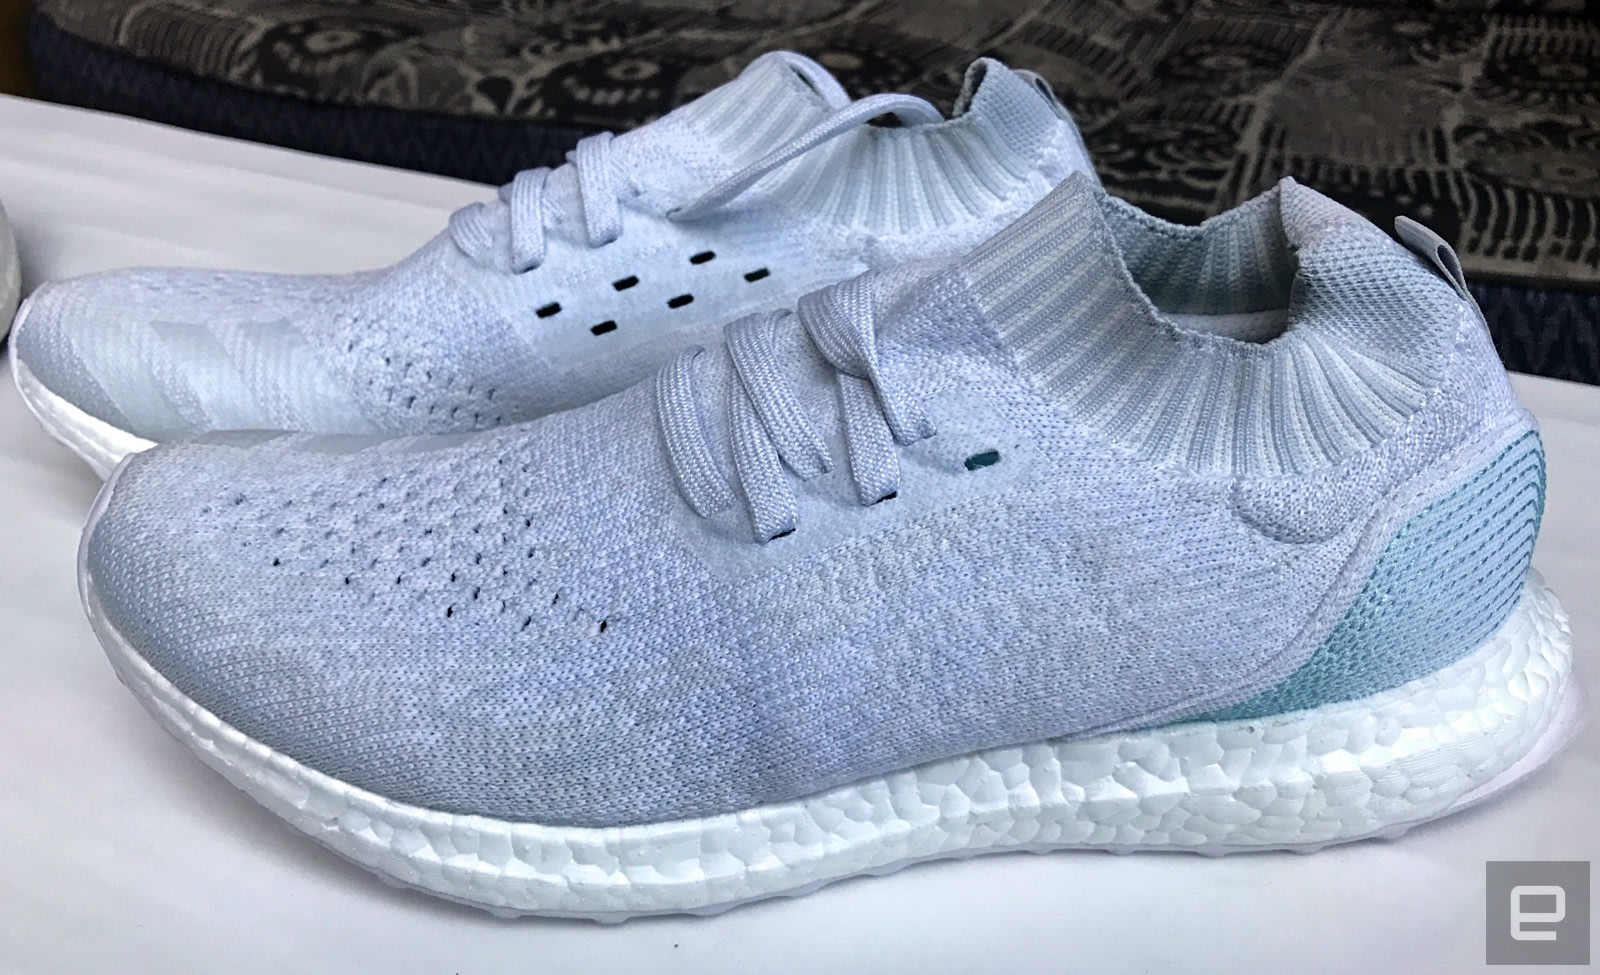 Adidas Shoe Ocean Waste